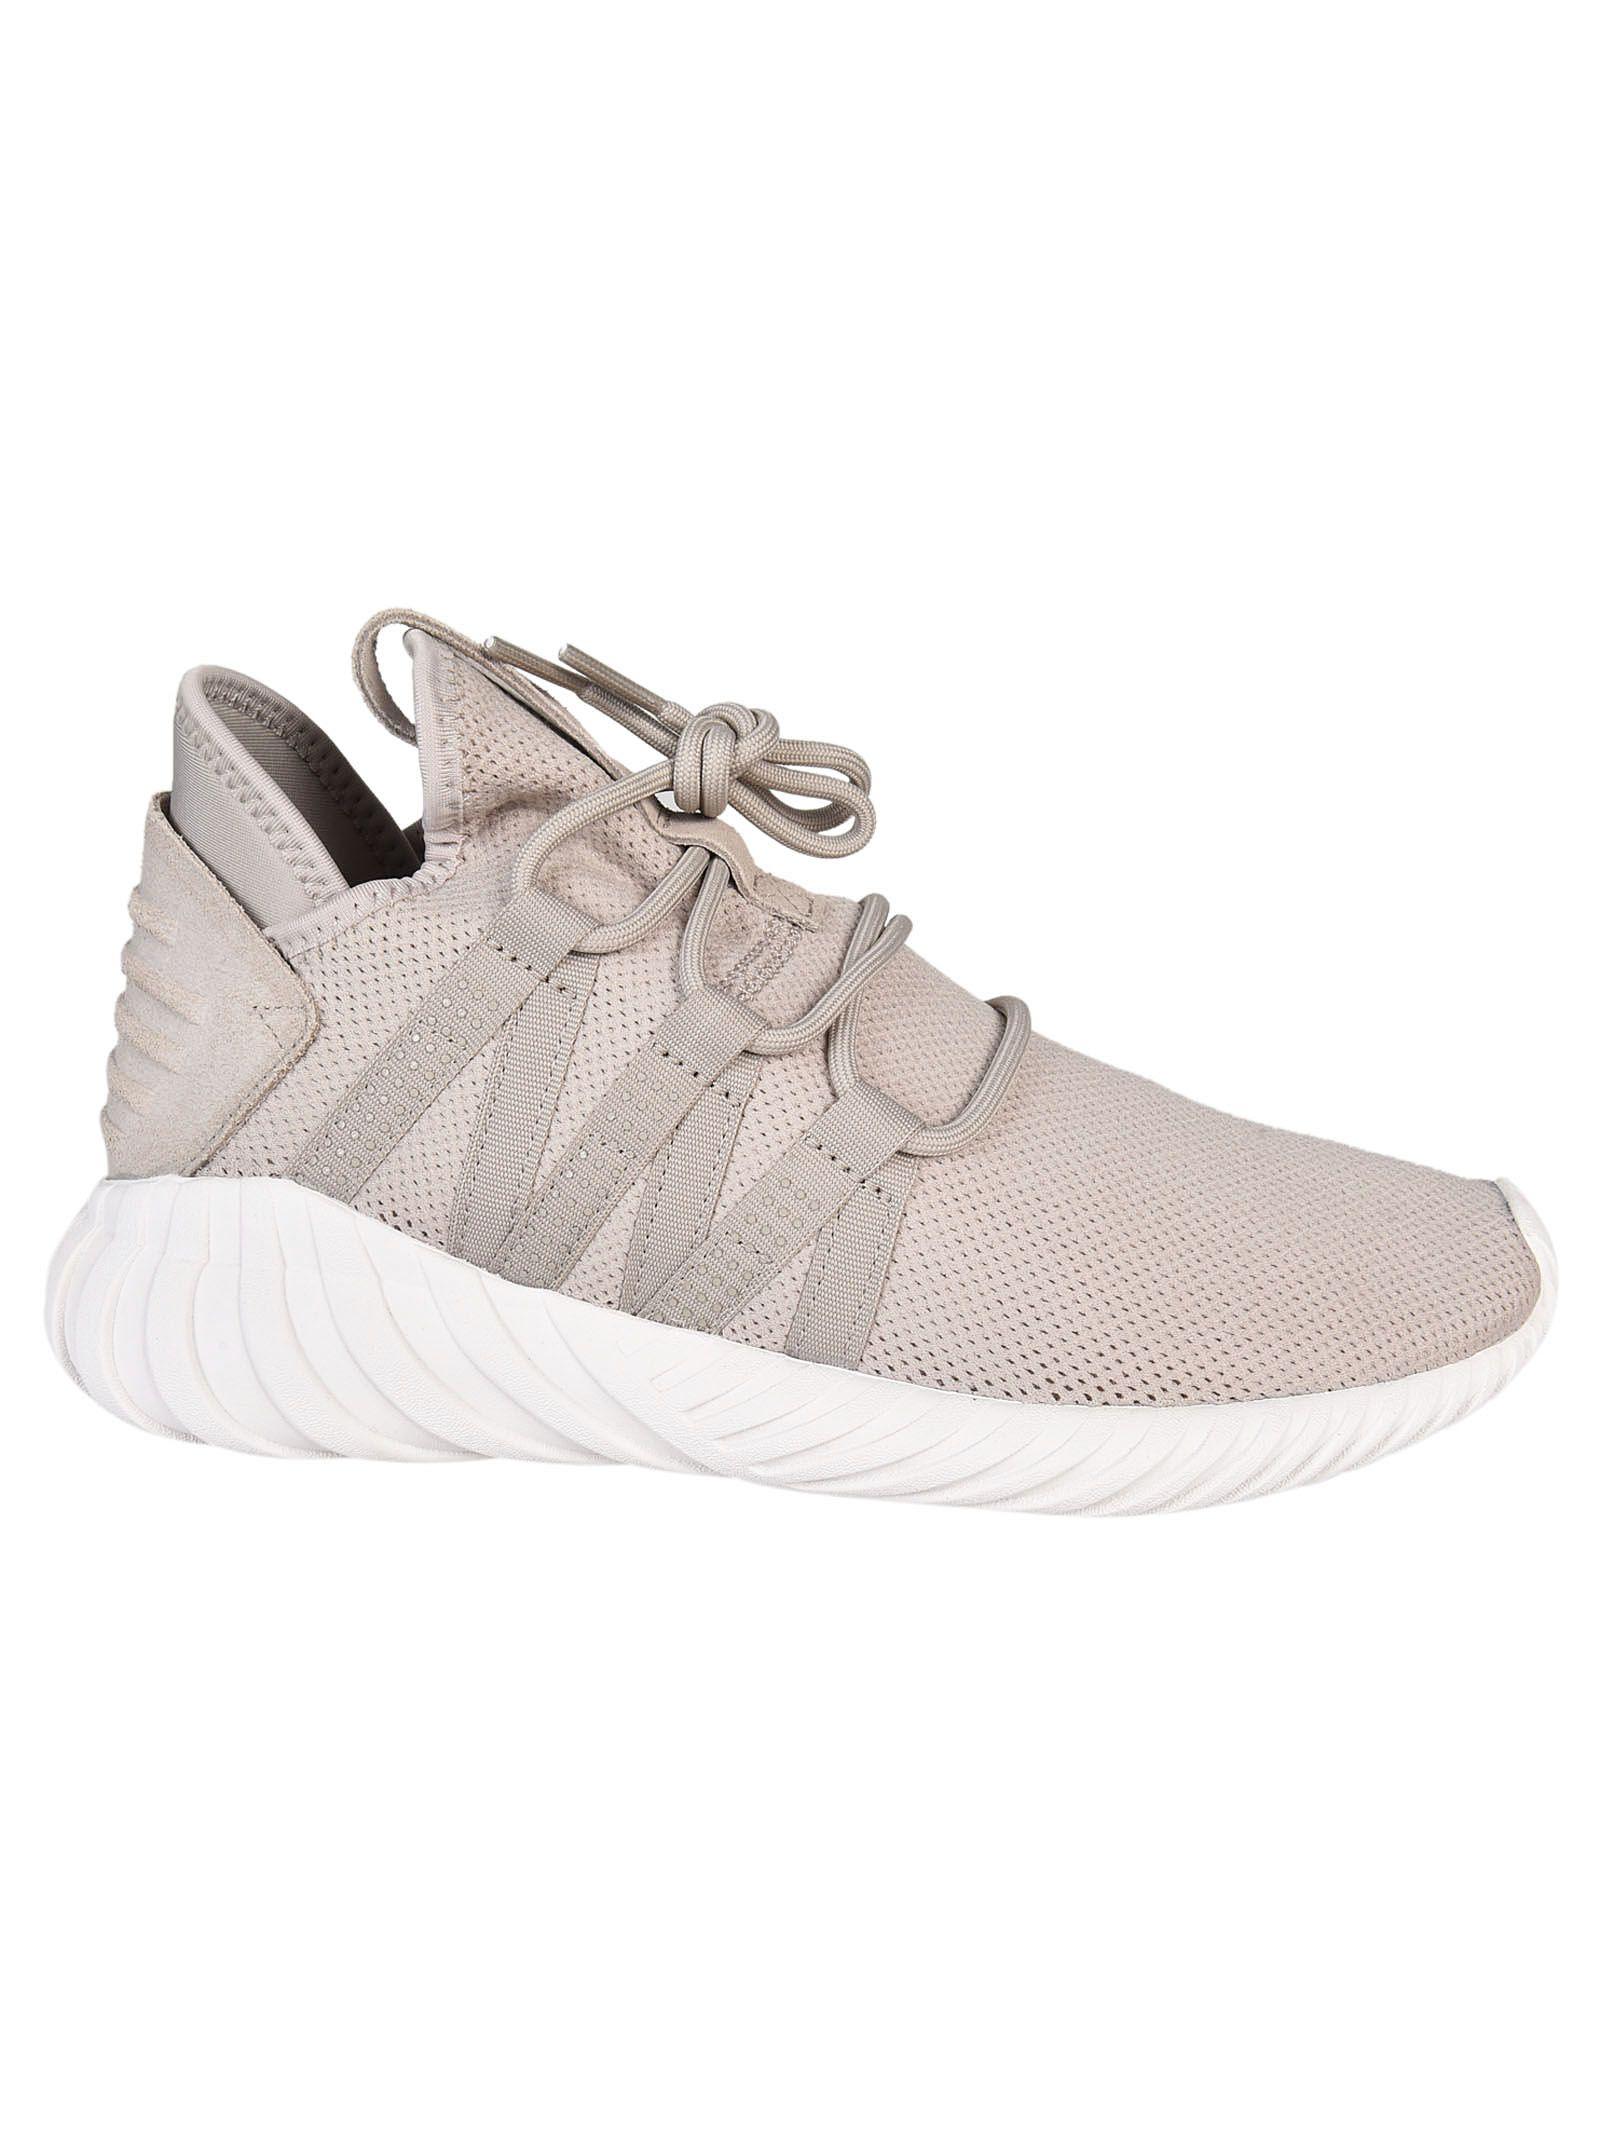 Adidas Tubular Dawn Sneakers